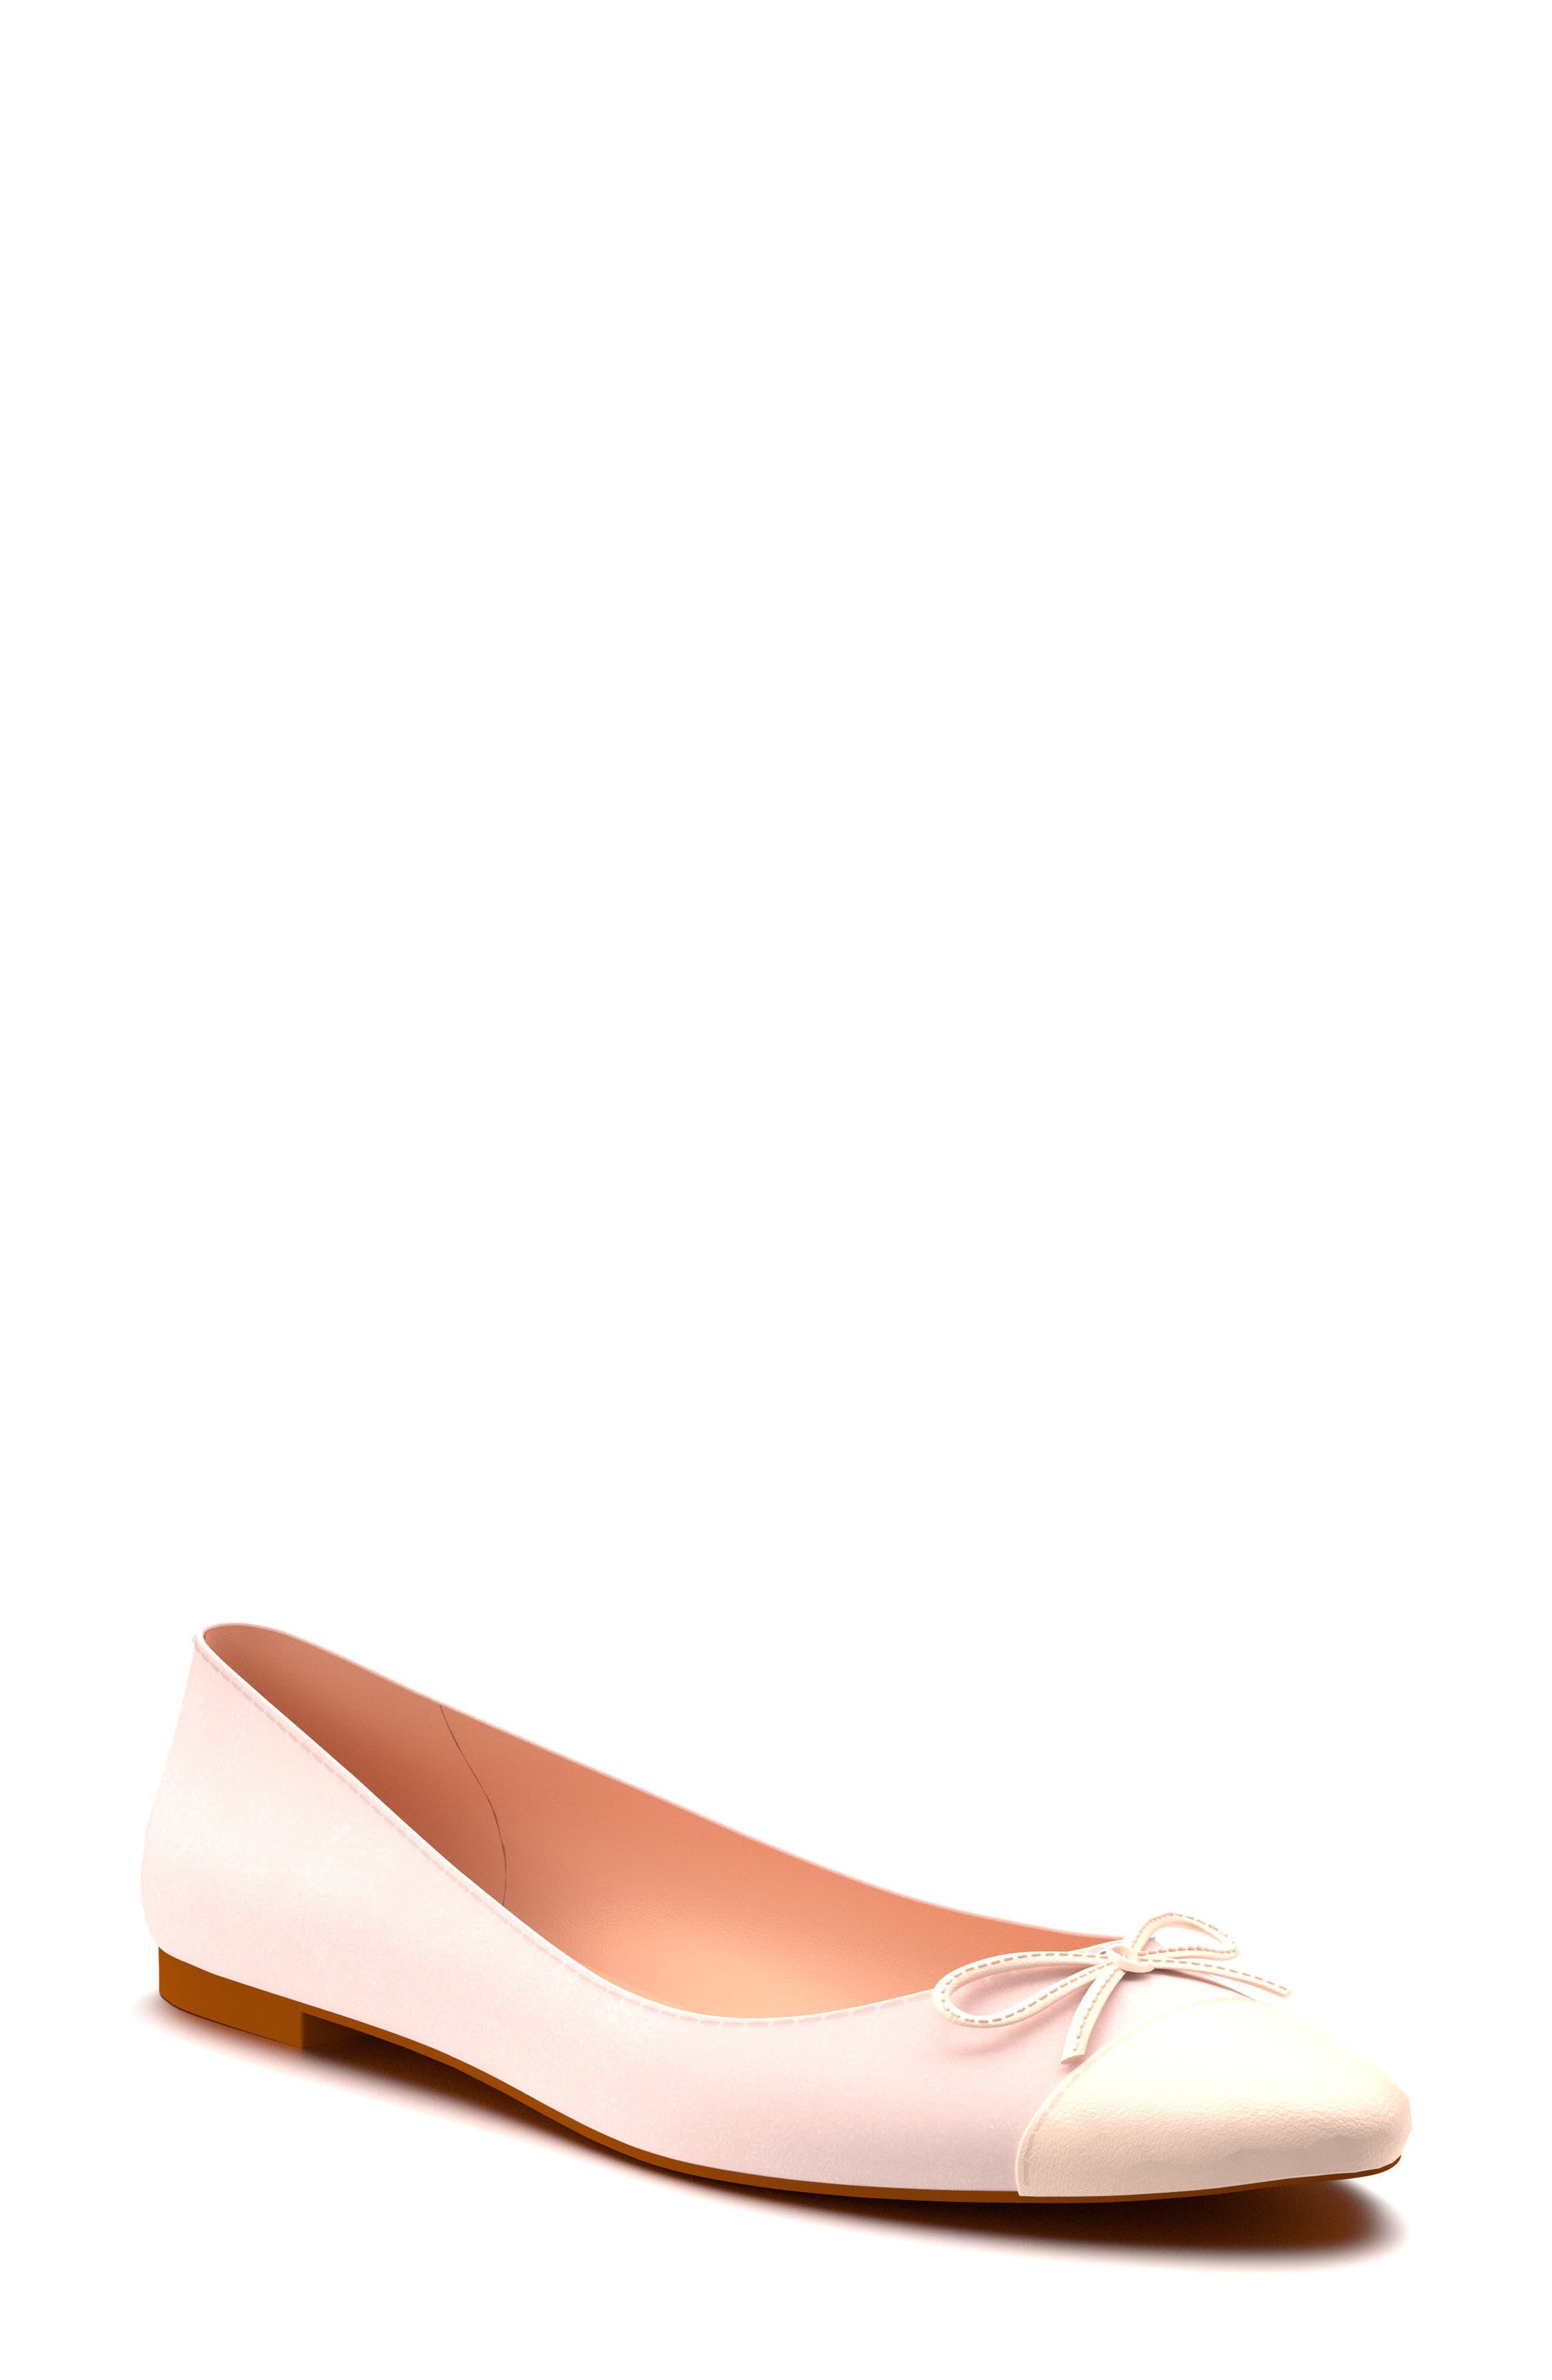 Shoes of Prey Almond Toe Ballet Flat (Women)